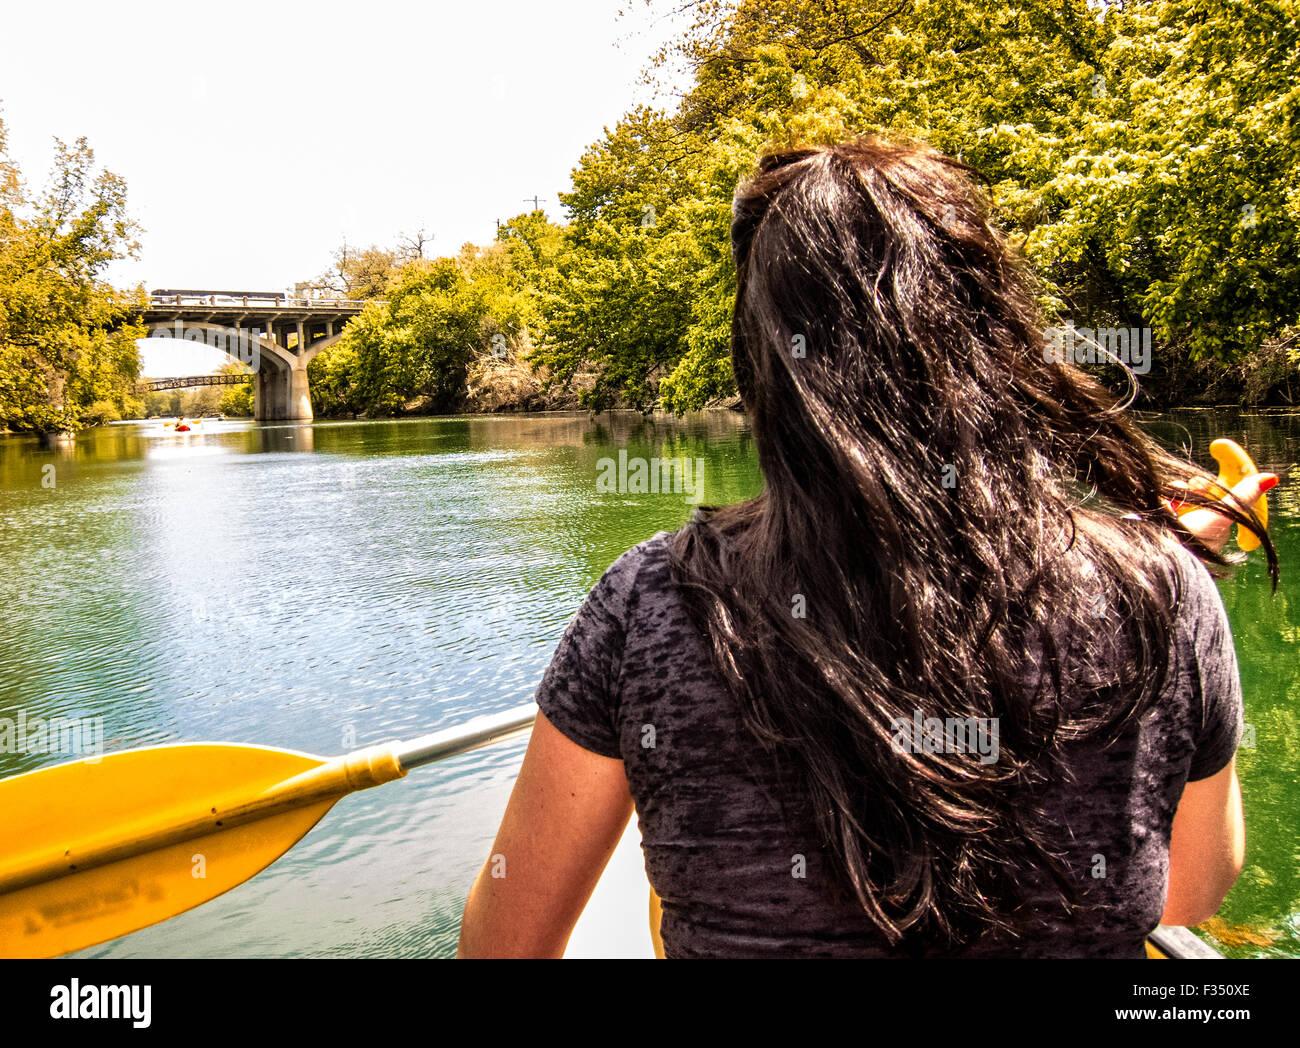 Junge Frau Kanufahren auf Barton Creek, Austin, Texas Stockbild